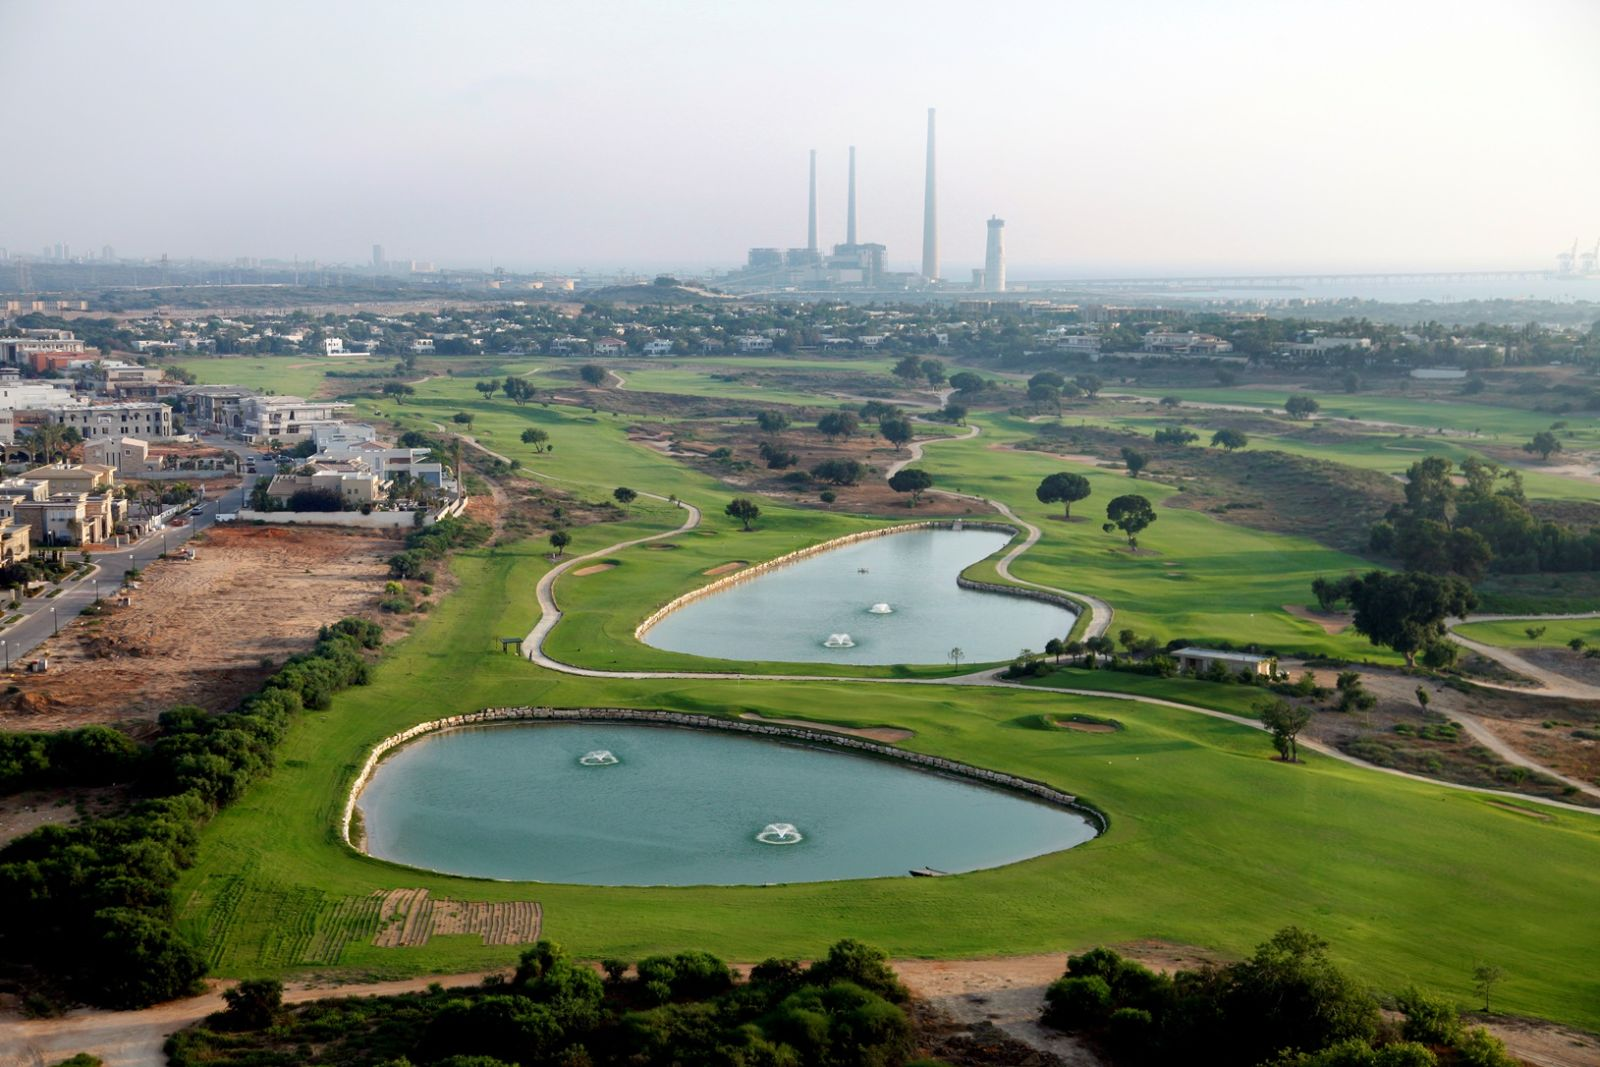 The golf course in Caesarea. Photo by Moshe Shai/FLASH90